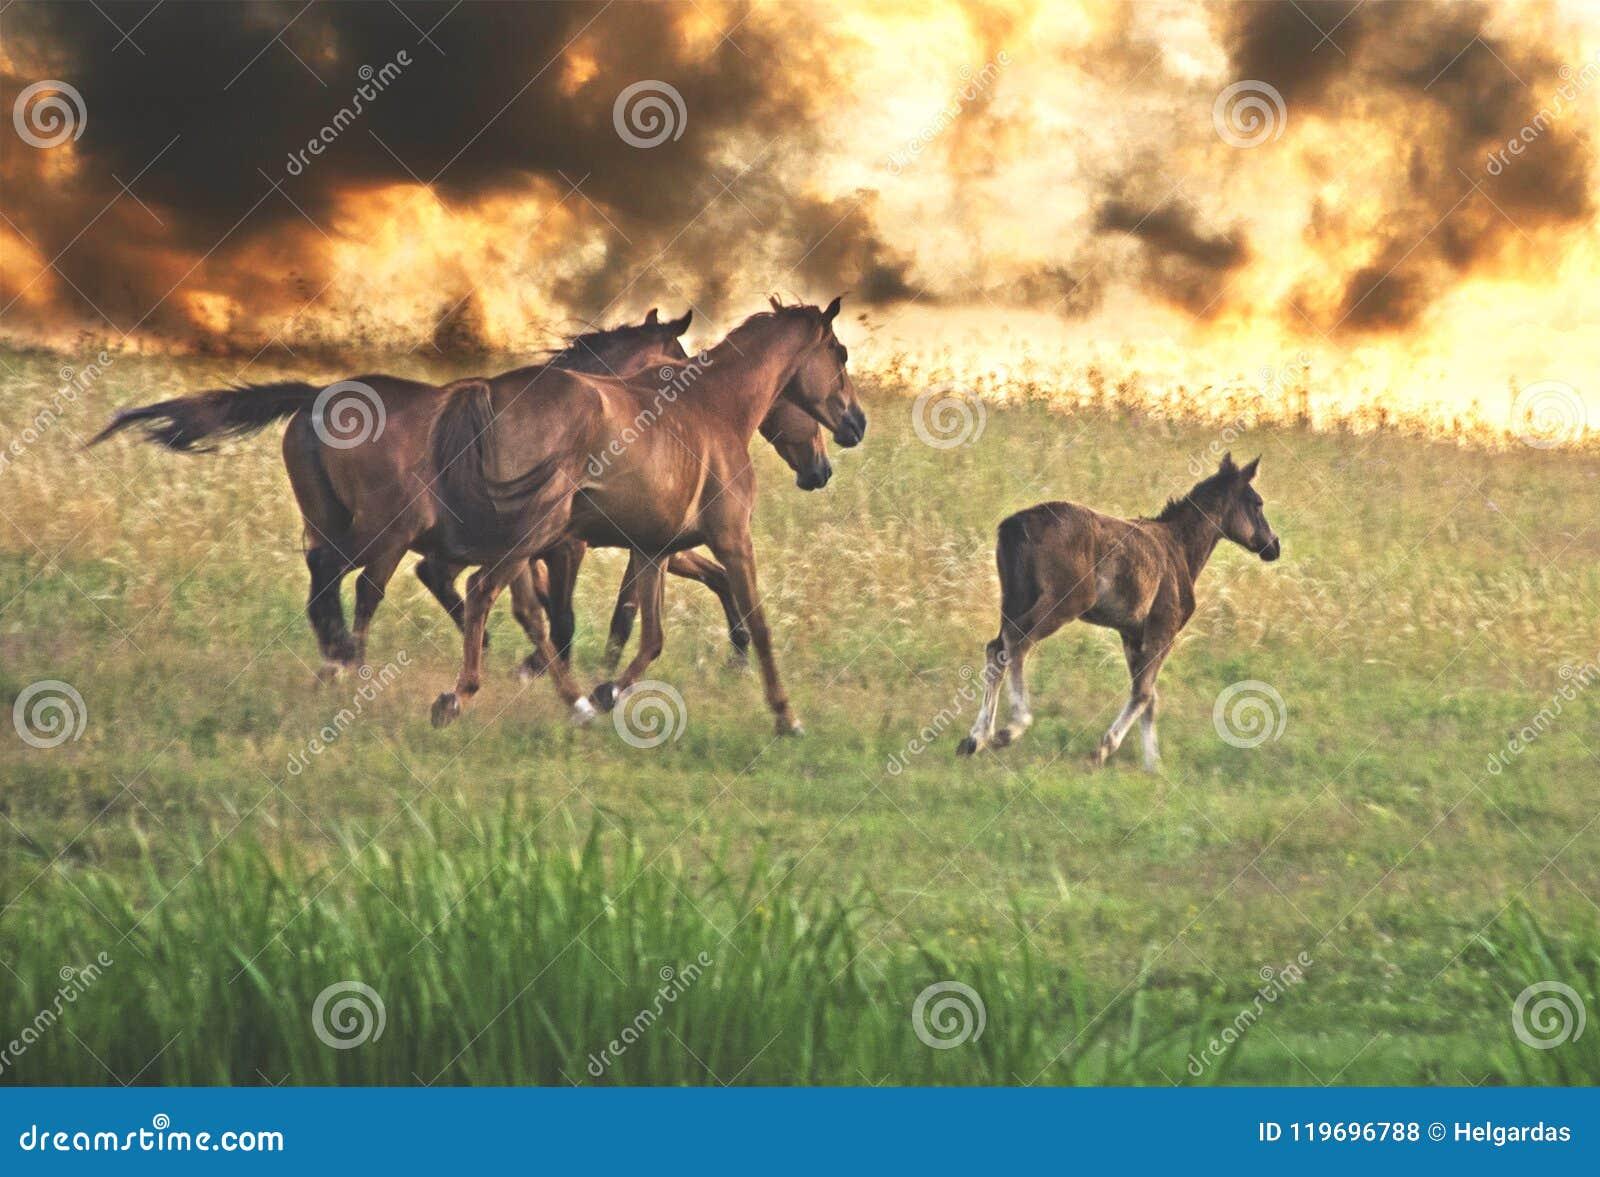 Horse at sunset run